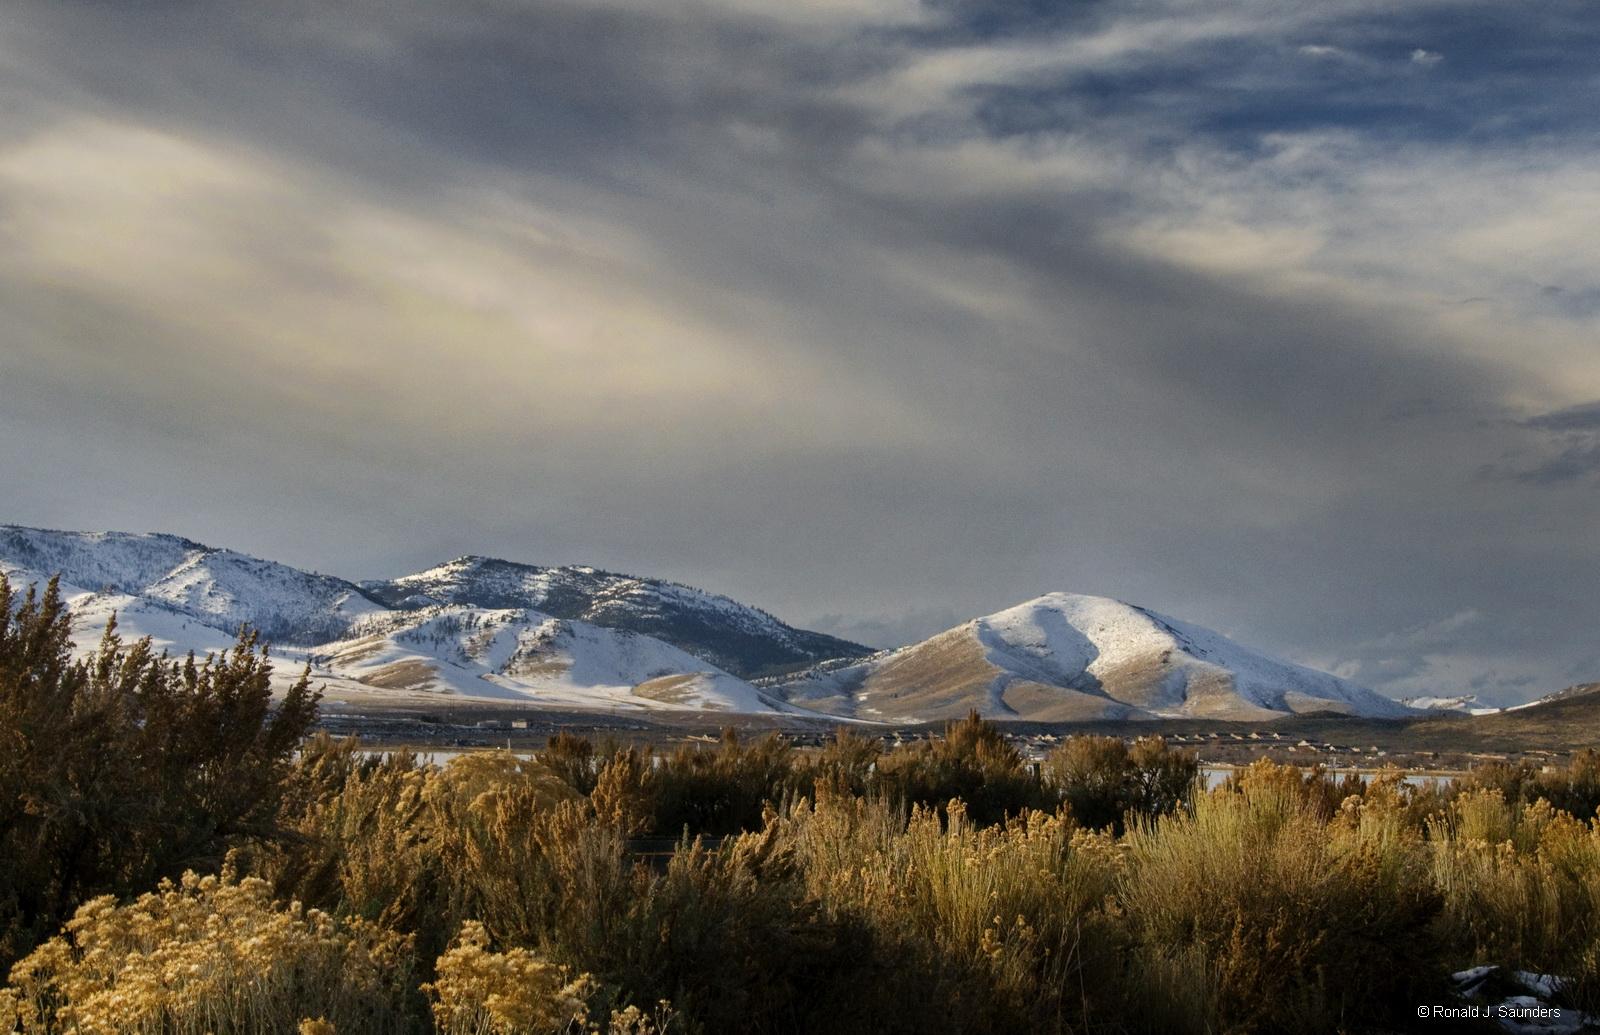 cold springs, nevada, desert, nevada, landscape, christmas, snow, photo